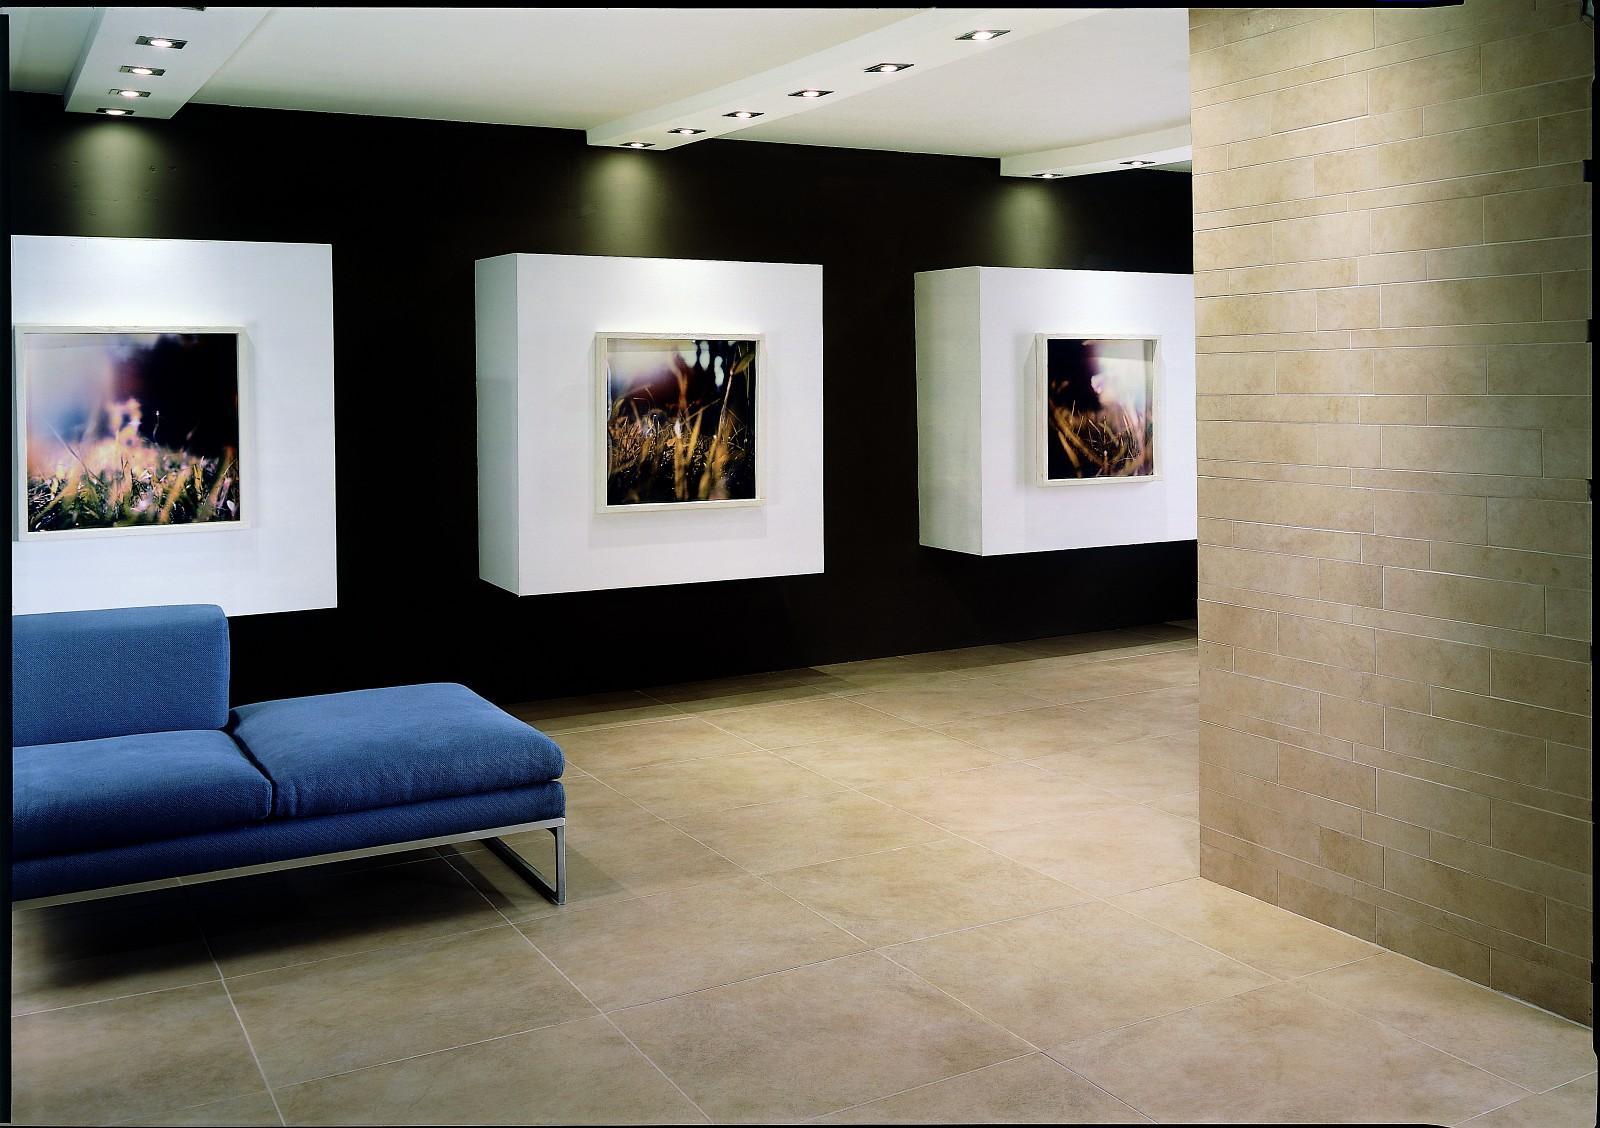 Gres porcellanato effetto cemento resina spatolata opaco - Prezzo posa piastrelle 60x60 ...